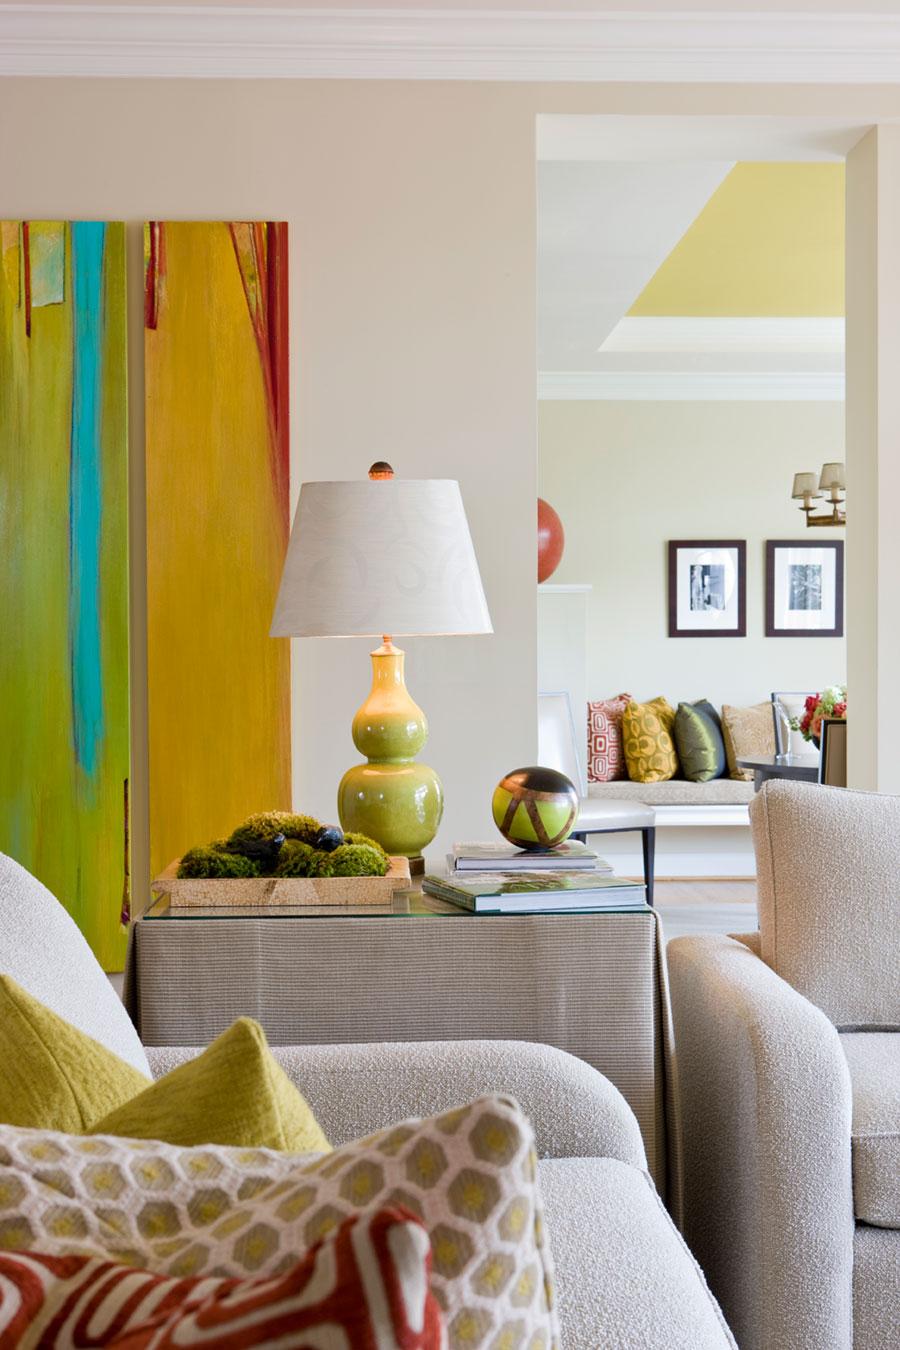 Panache Penthouse Bethesda Md Camille Saum Interior Design Llc